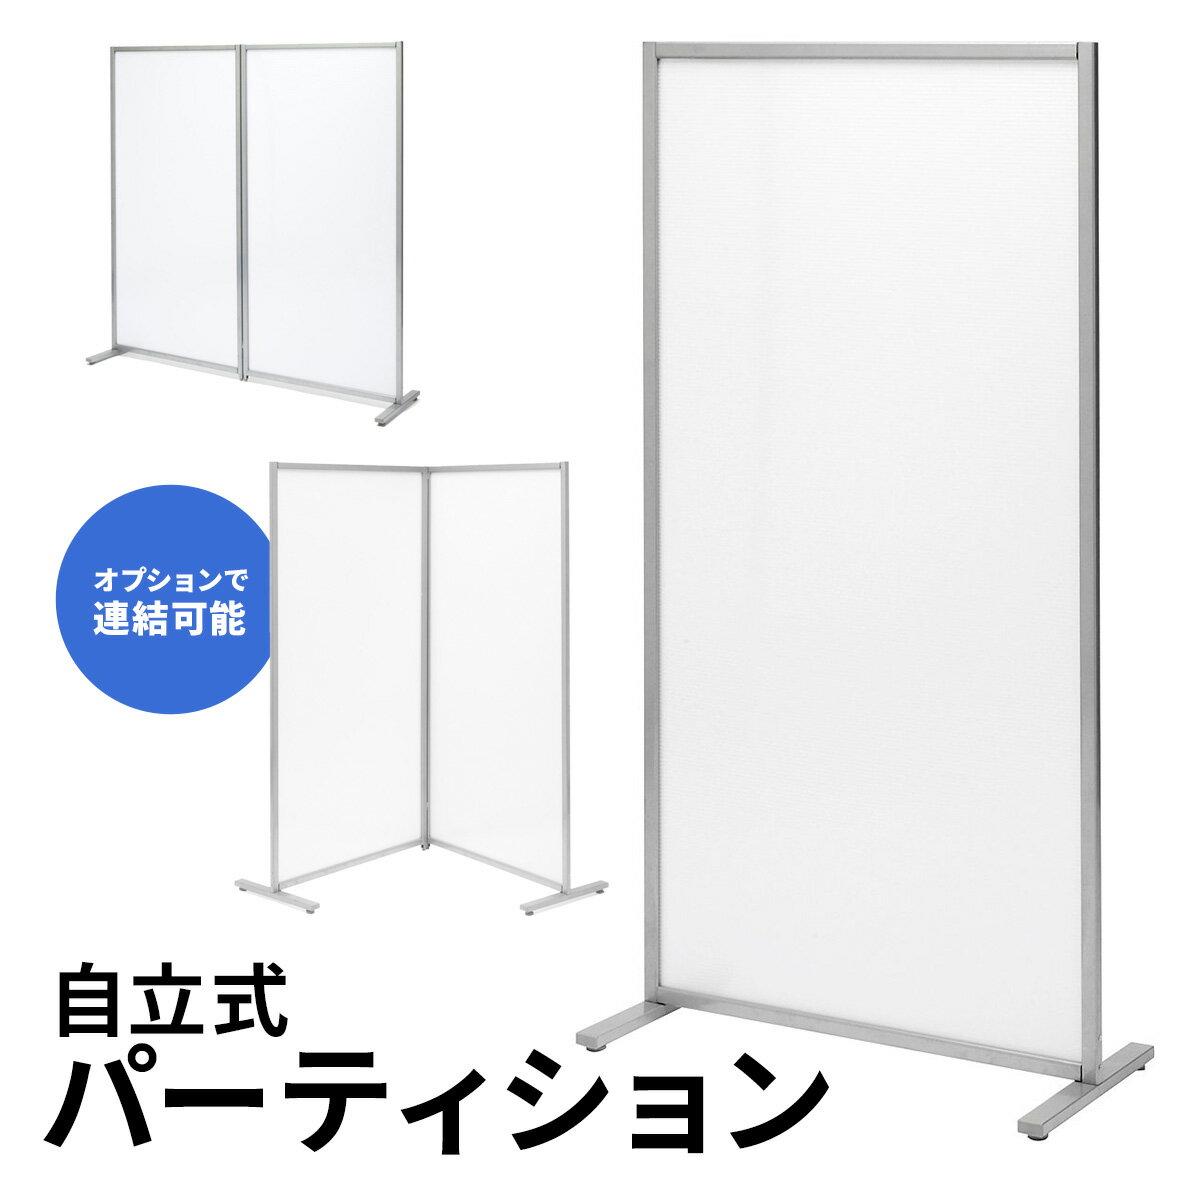 SANWASUPPLY(サンワサプライ)『オフィスパーテーション自立式・半透明(100-SPT001)』